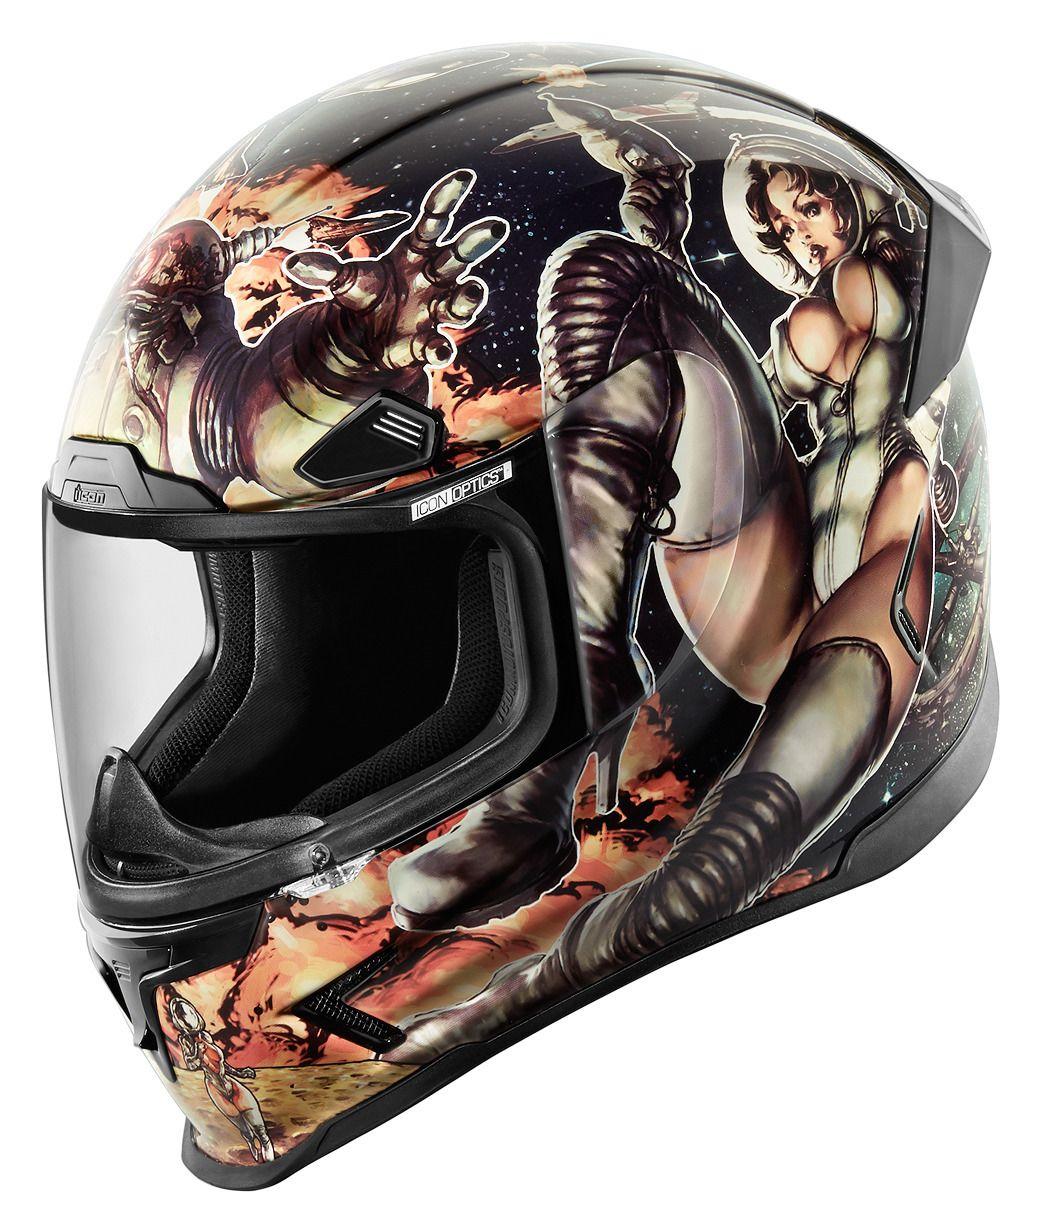 Icon Airframe Pro Pleasuredome 2 Helmet Sz Xs Only